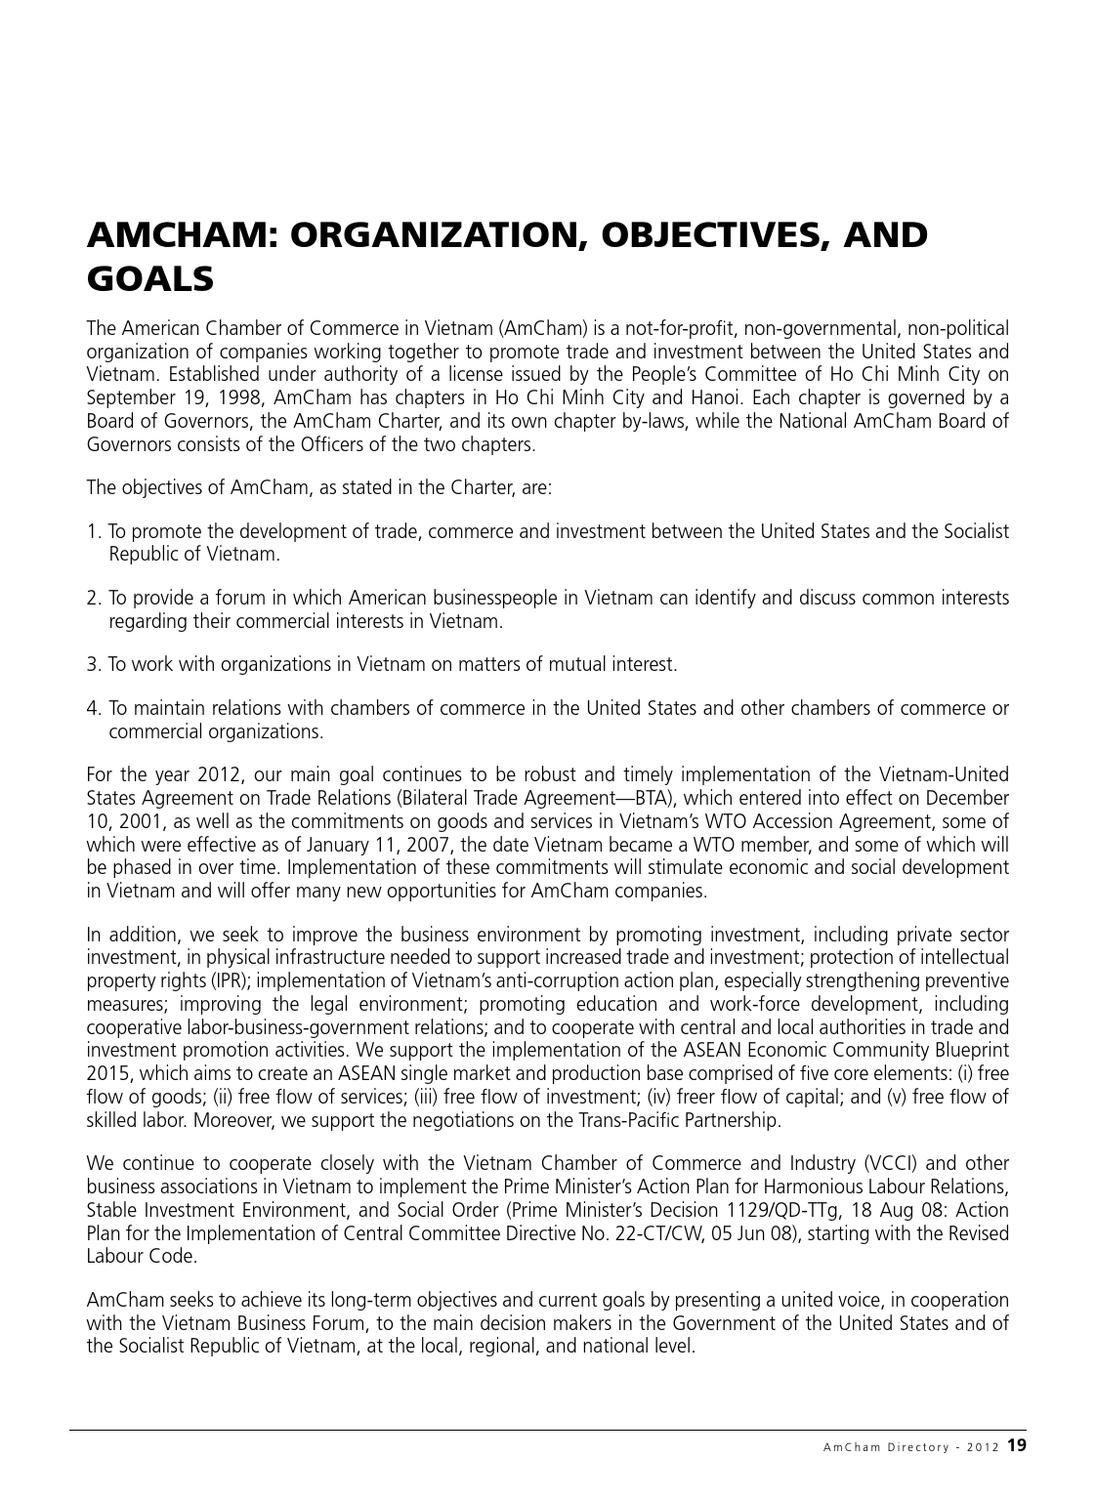 AmCham Vietnam in HCMC - Membership Directory 2012 by Minh